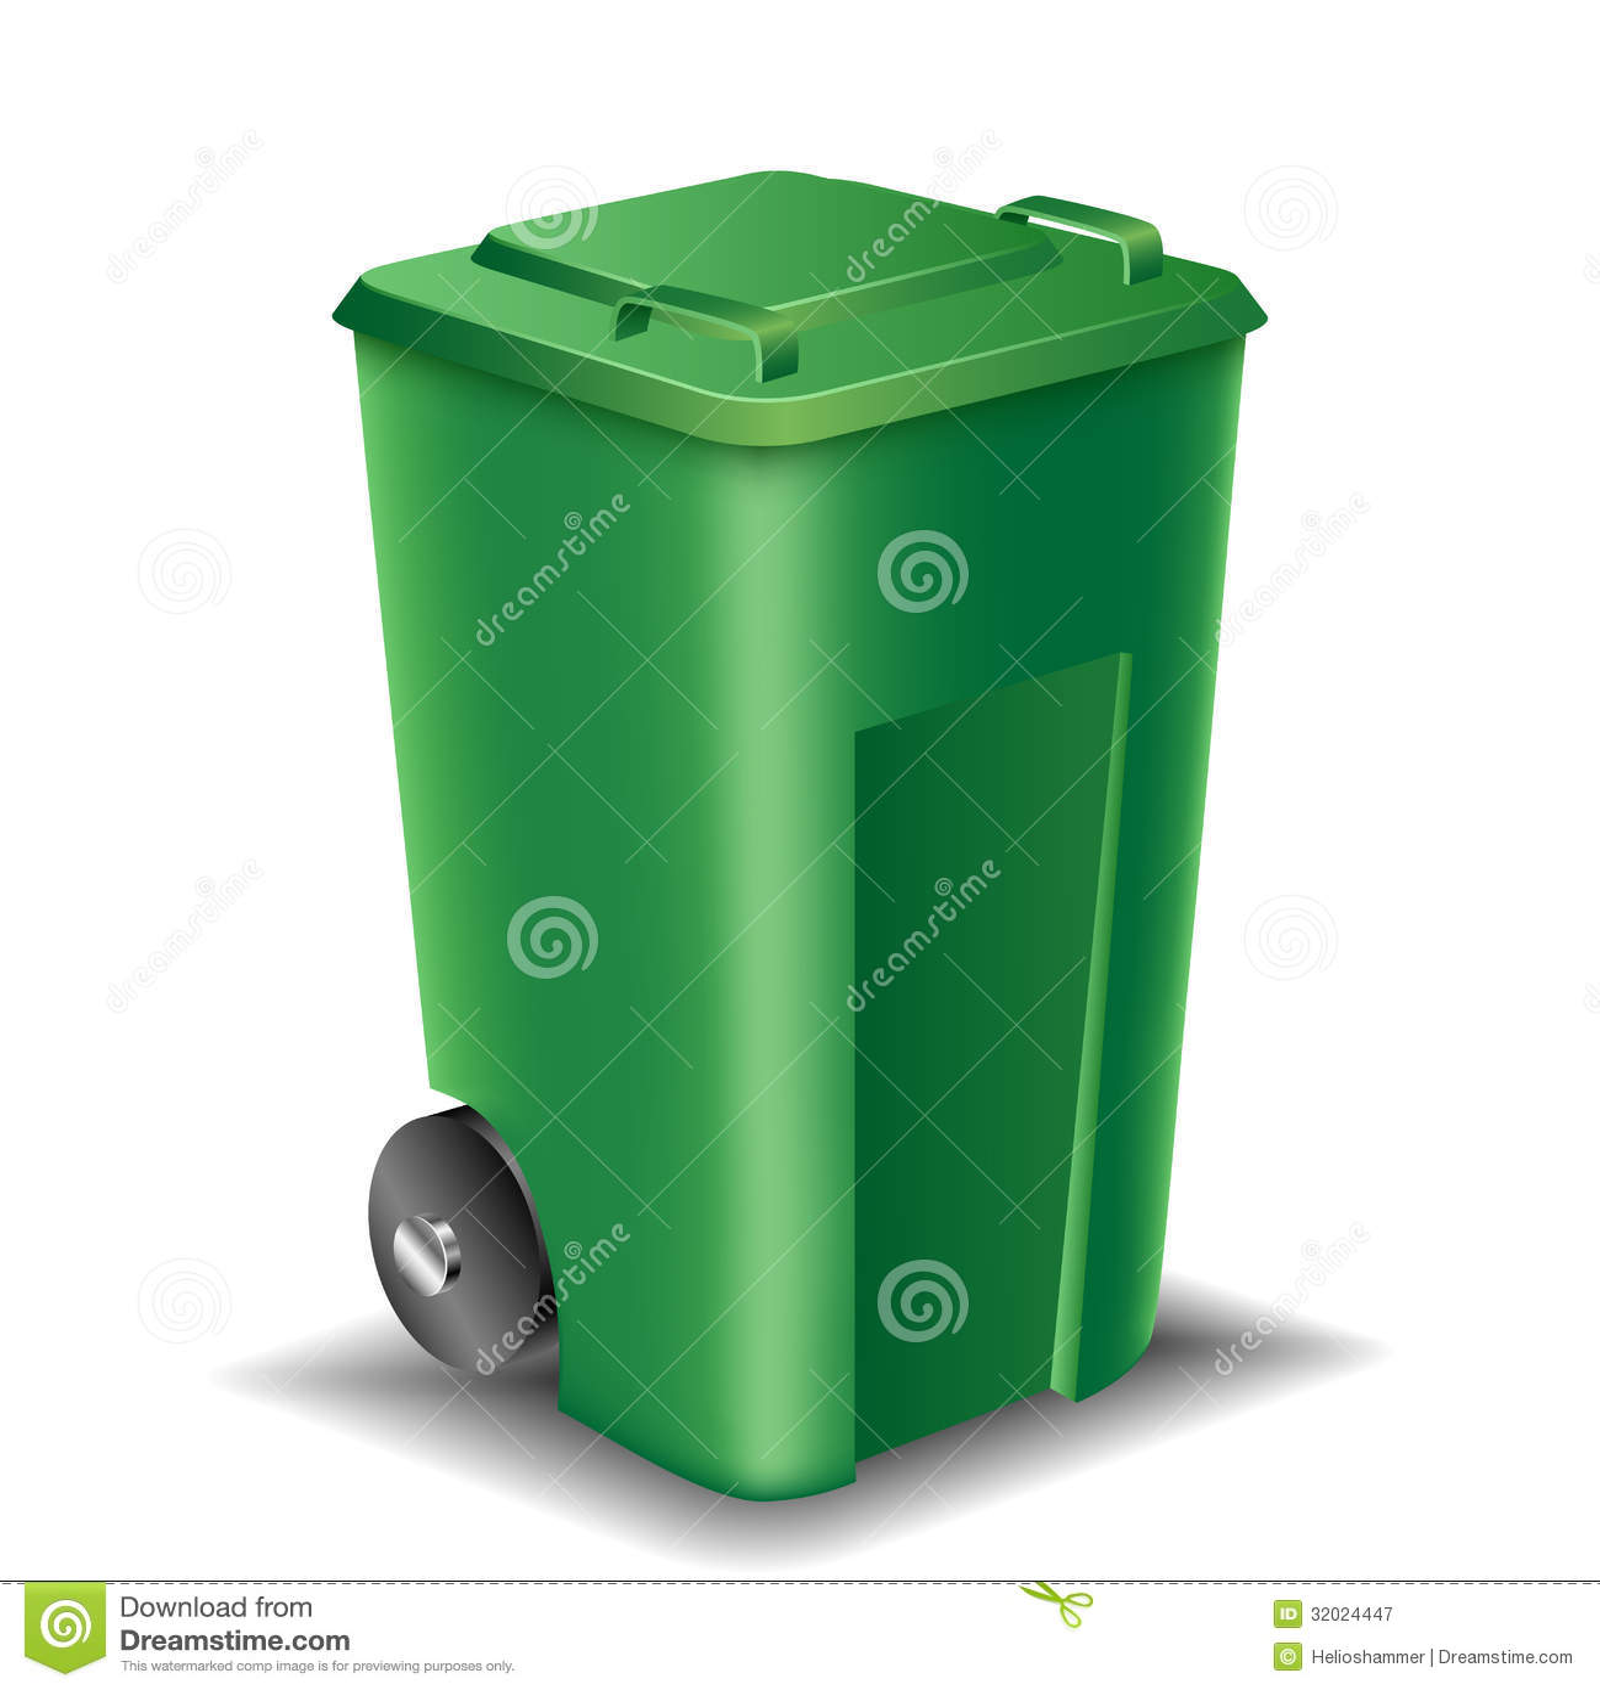 Dirt Street Stock >> Green street trash can stock image. Image of basket, dustbin - 32024447